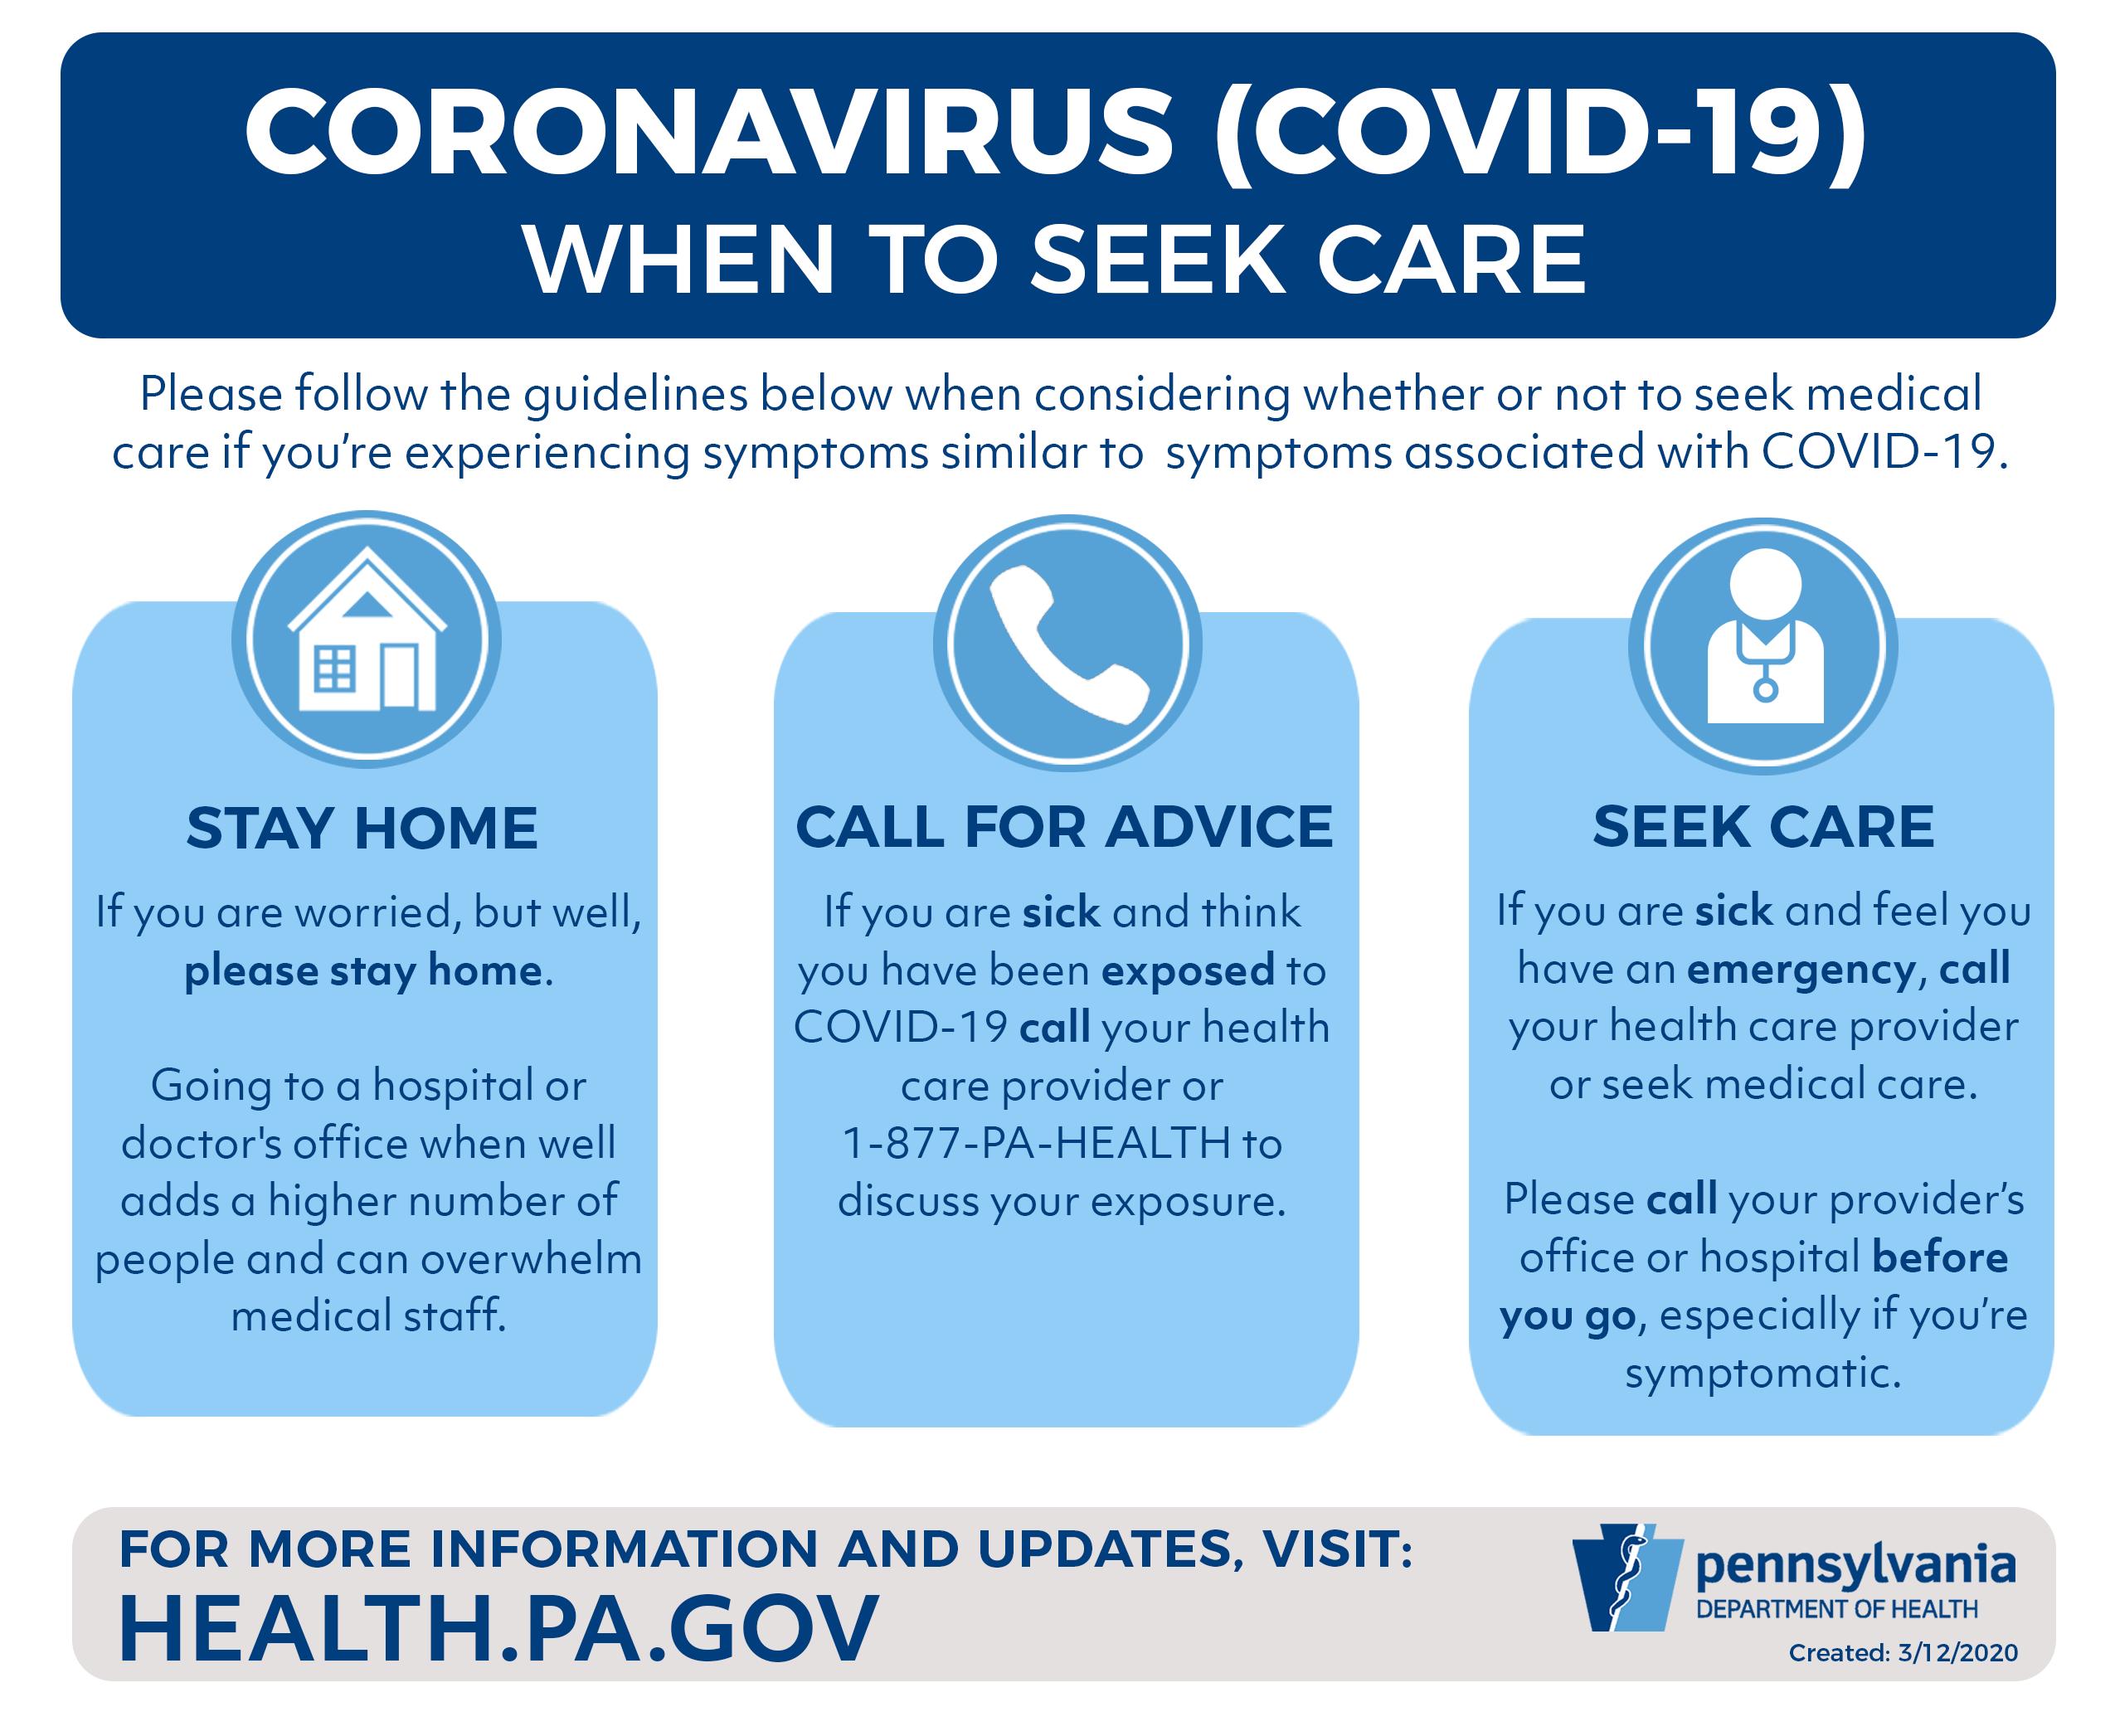 https://www.health.pa.gov/topics/disease/PublishingImages/Coronavirus%20When%20to%20Seek%20Care.png